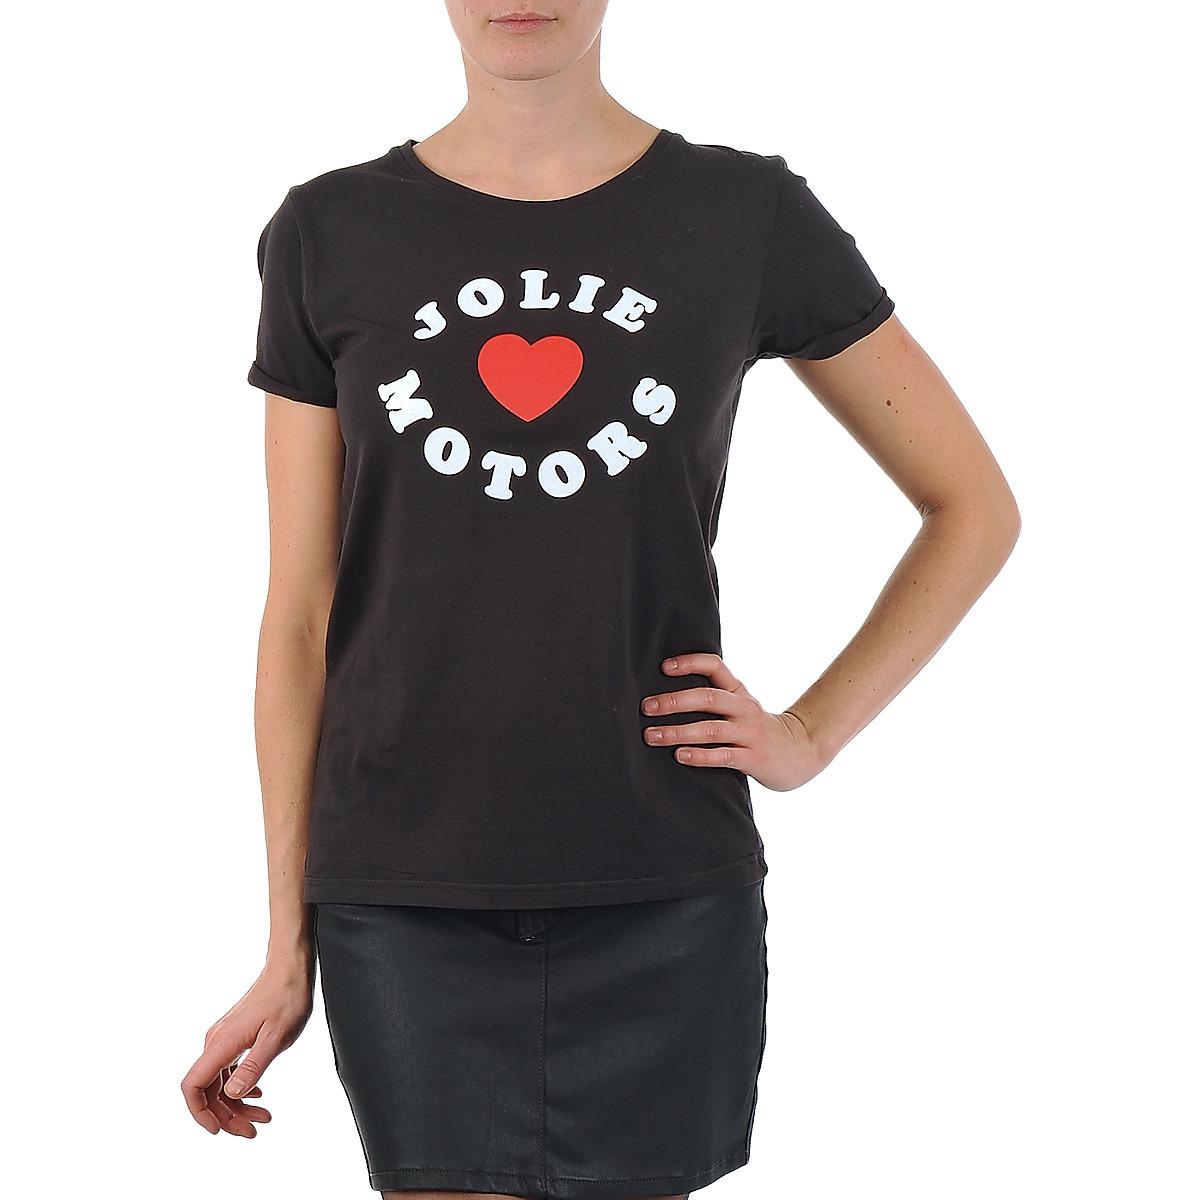 Kulte LOUISA JOLIEMOTOR 101954 NOIR Noir